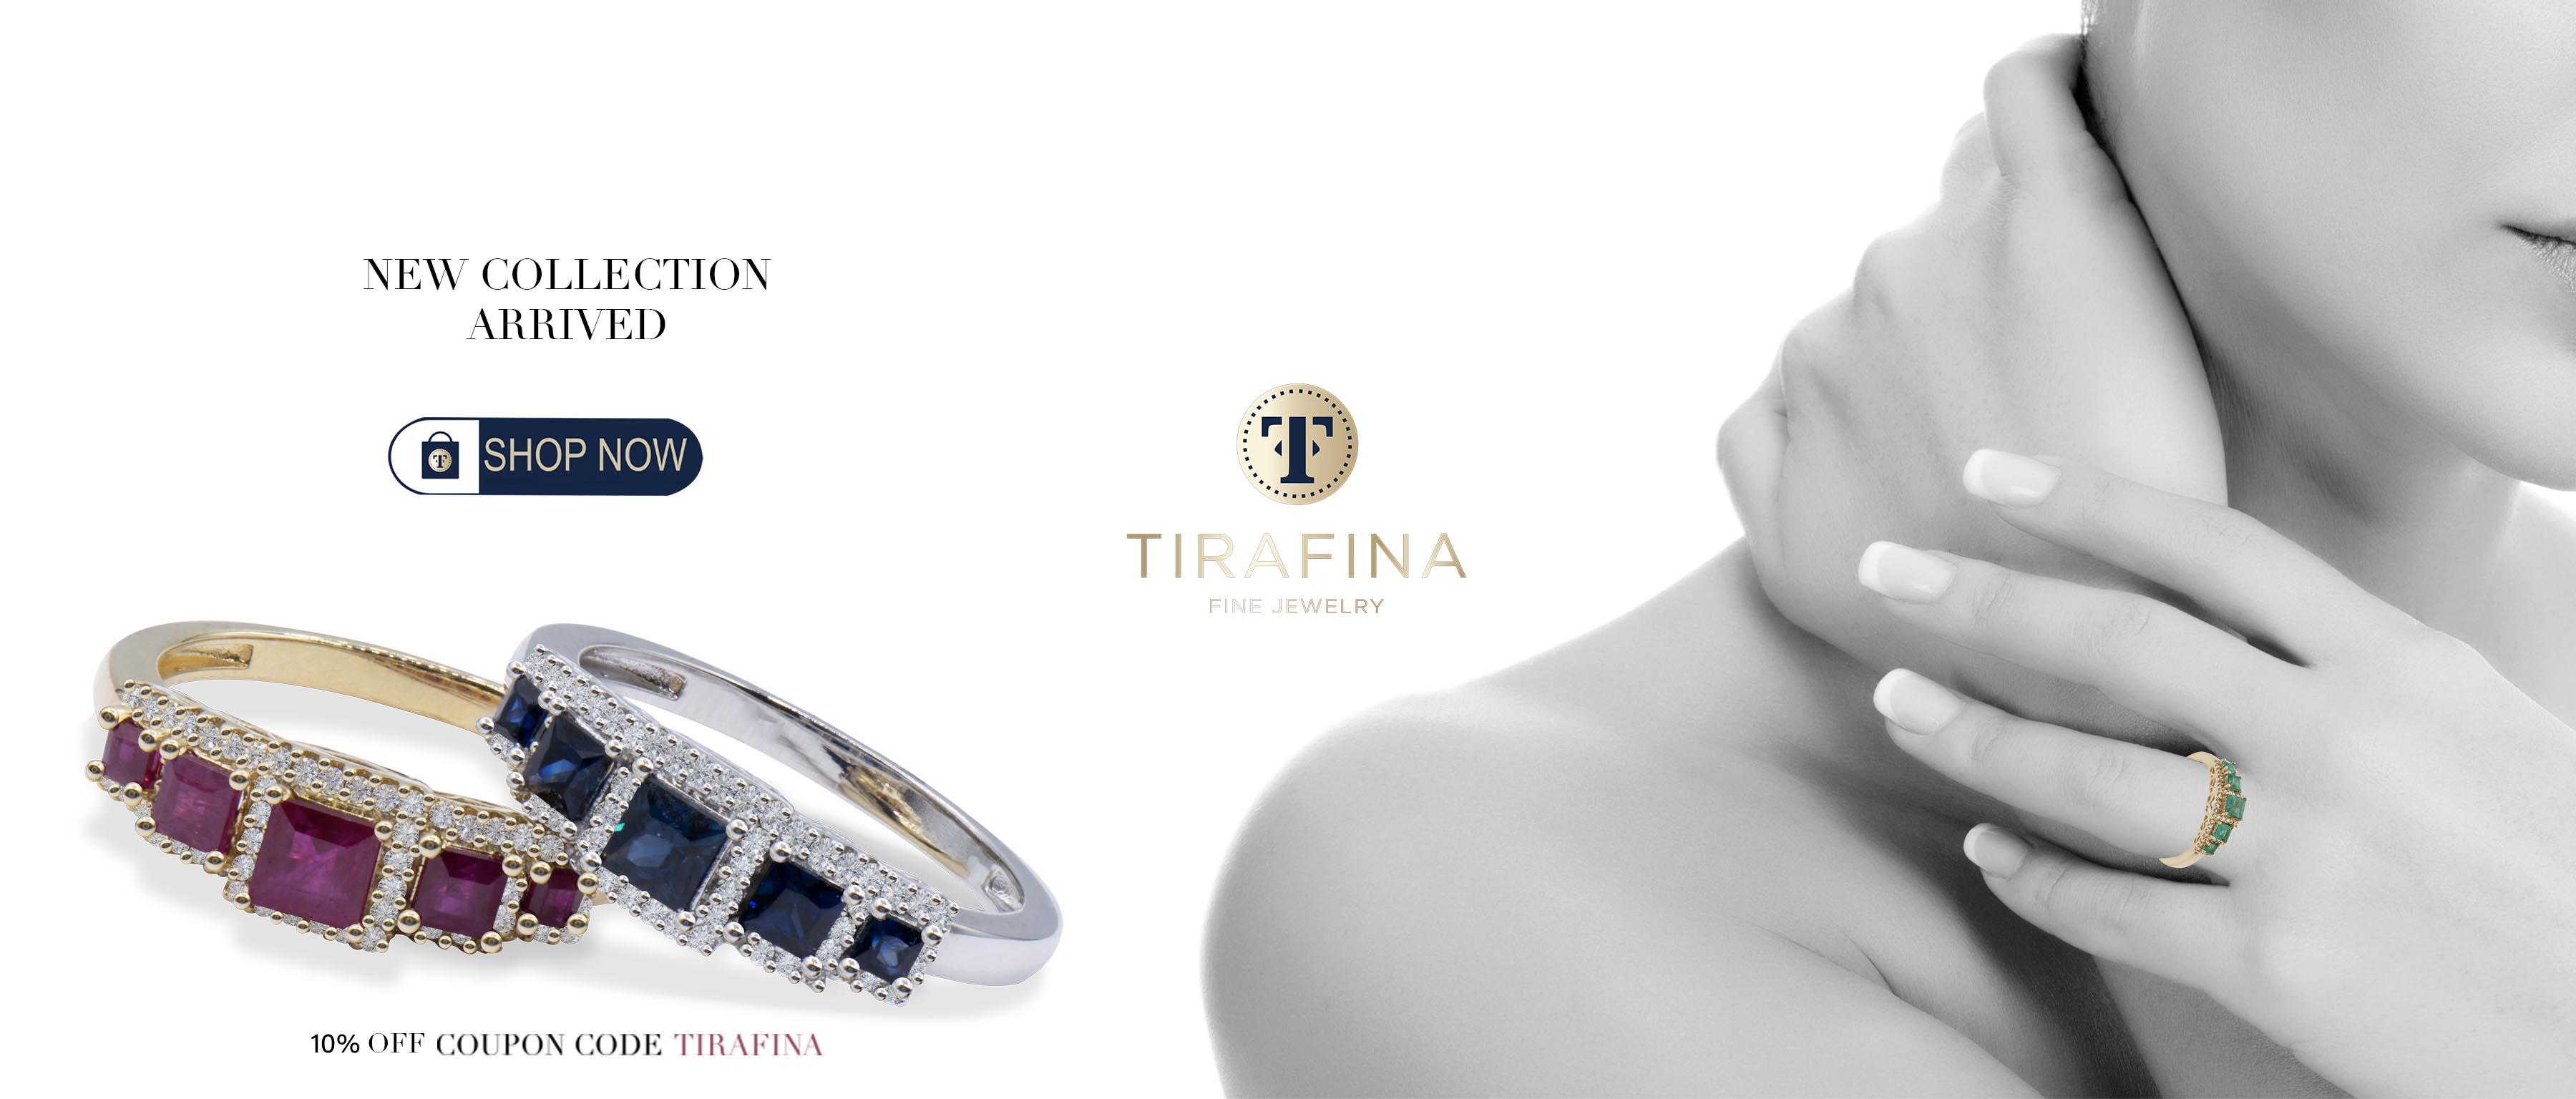 Tirafina jewelry shop diamonds